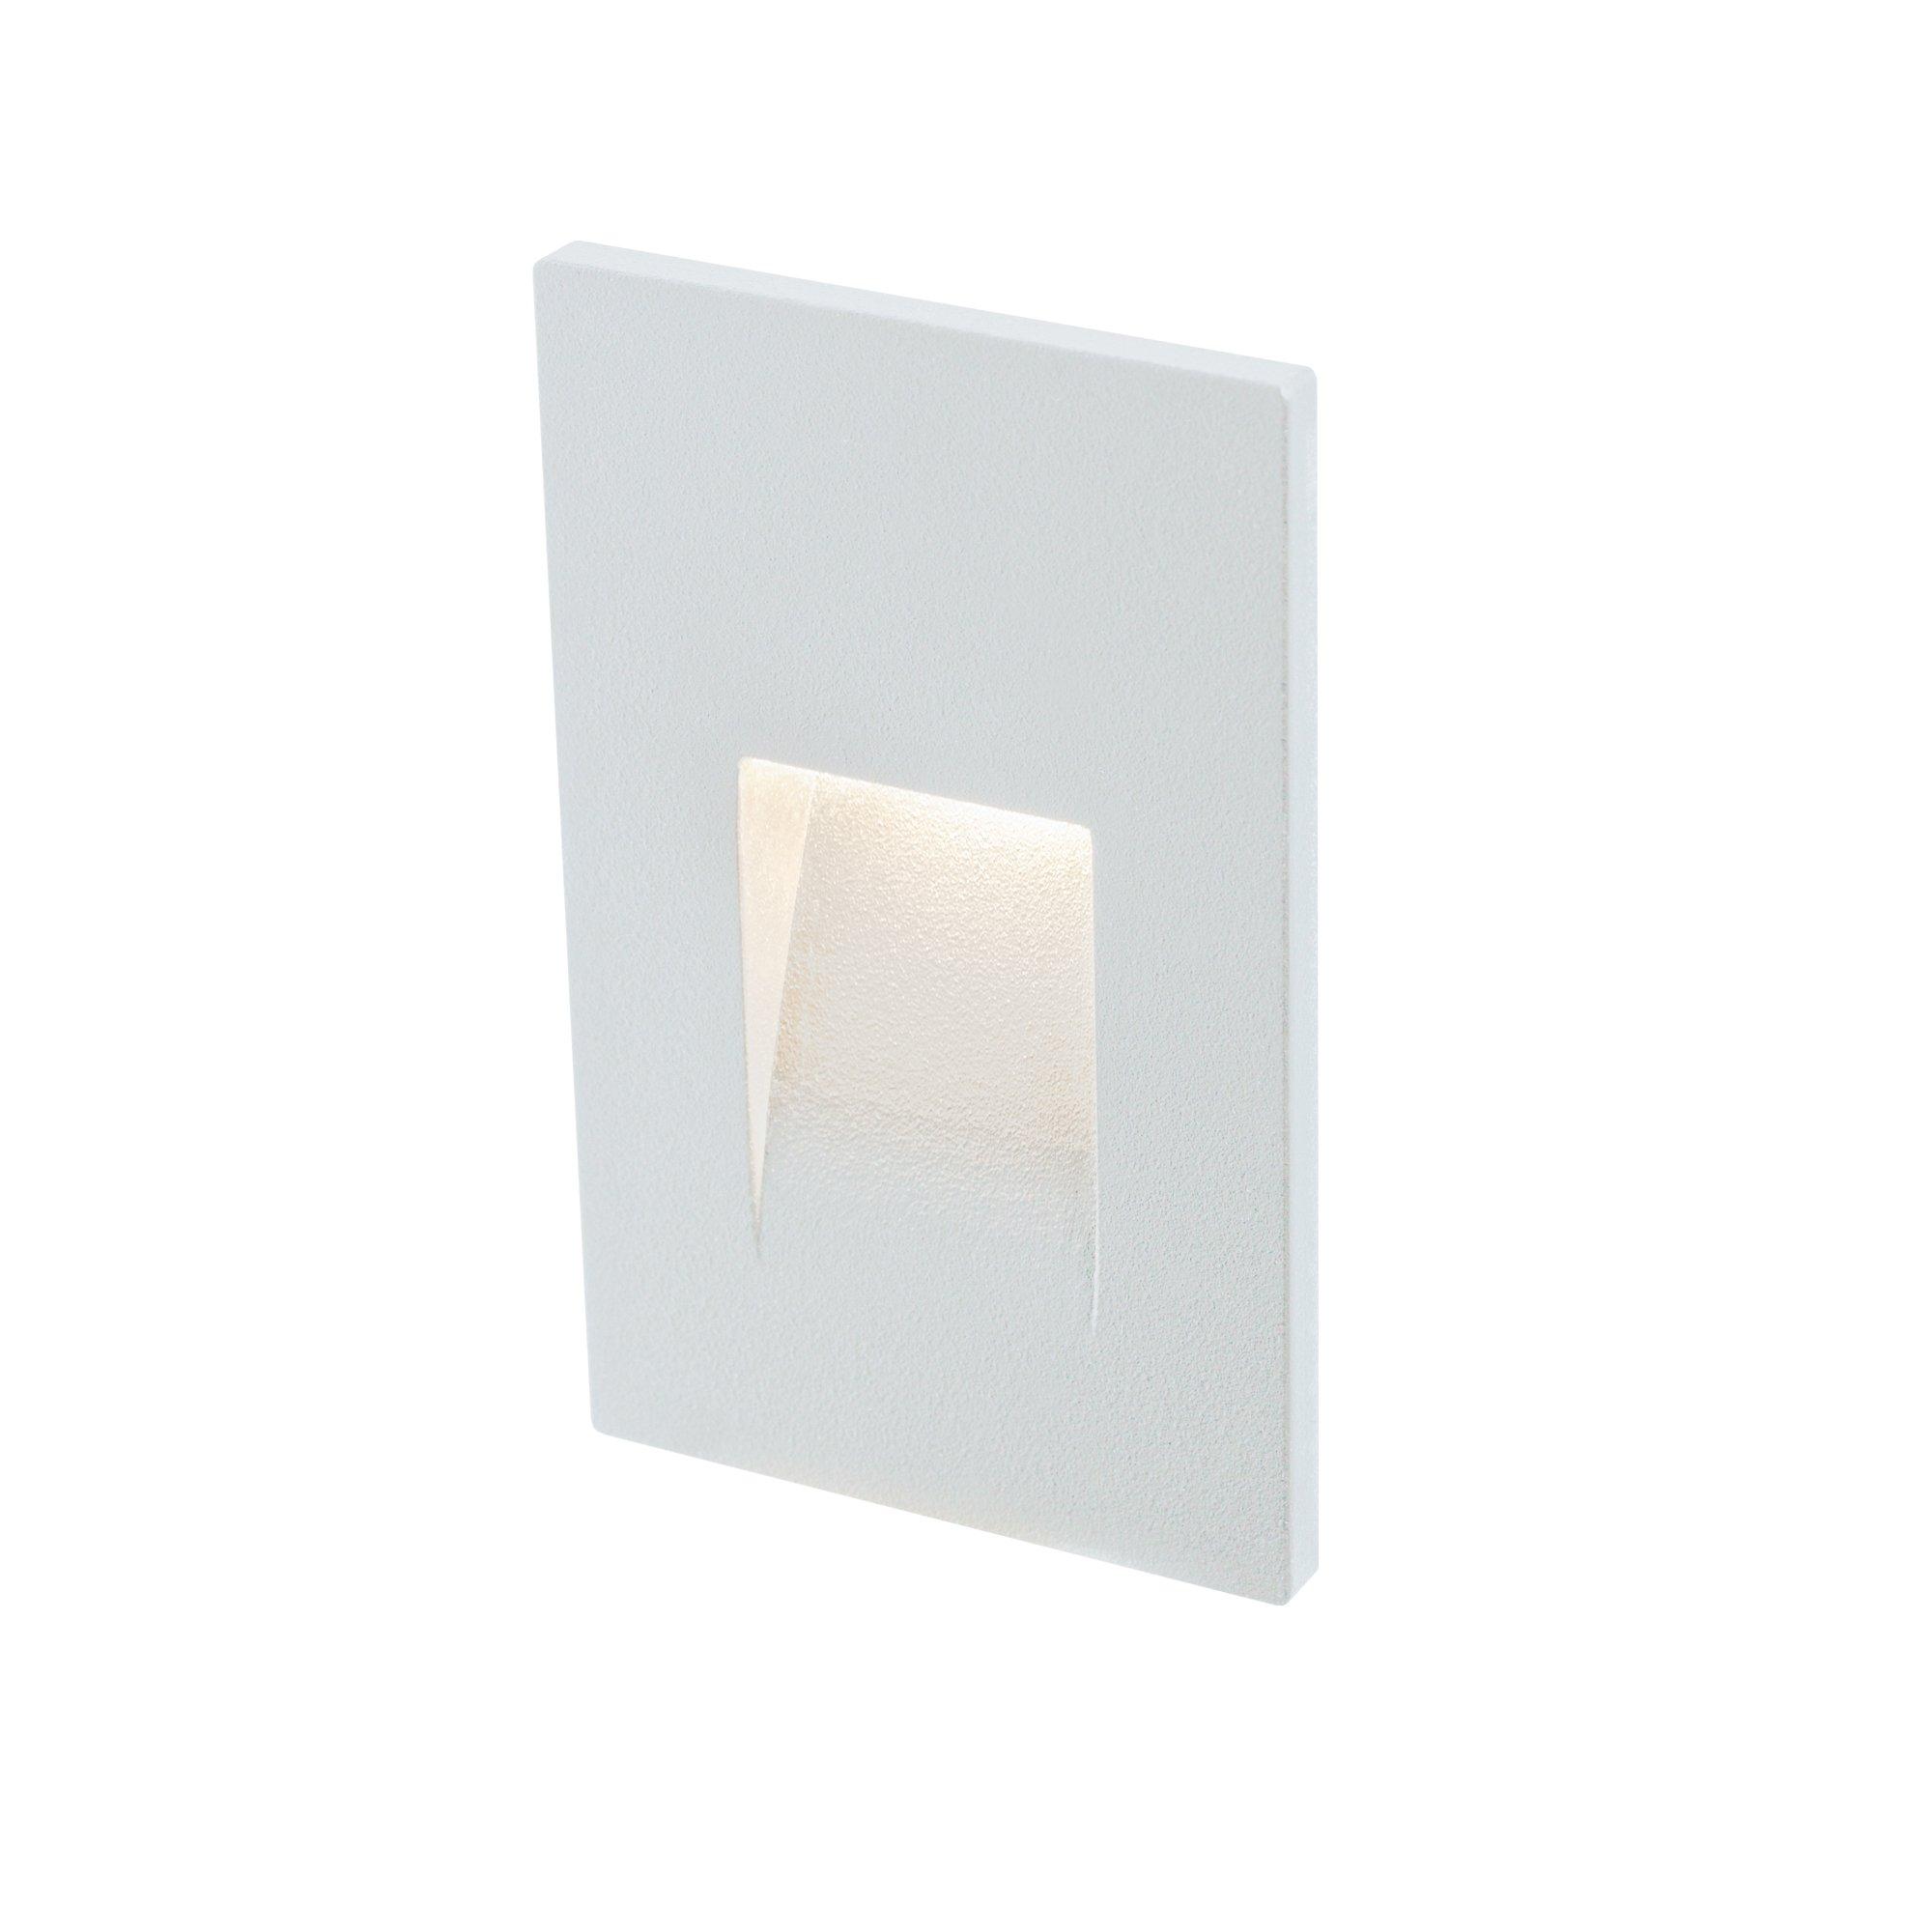 DALS Lighting LEDSTEP002D-WH 3'' Recessed Vertical Indoor/Outdoor LED Step Light White